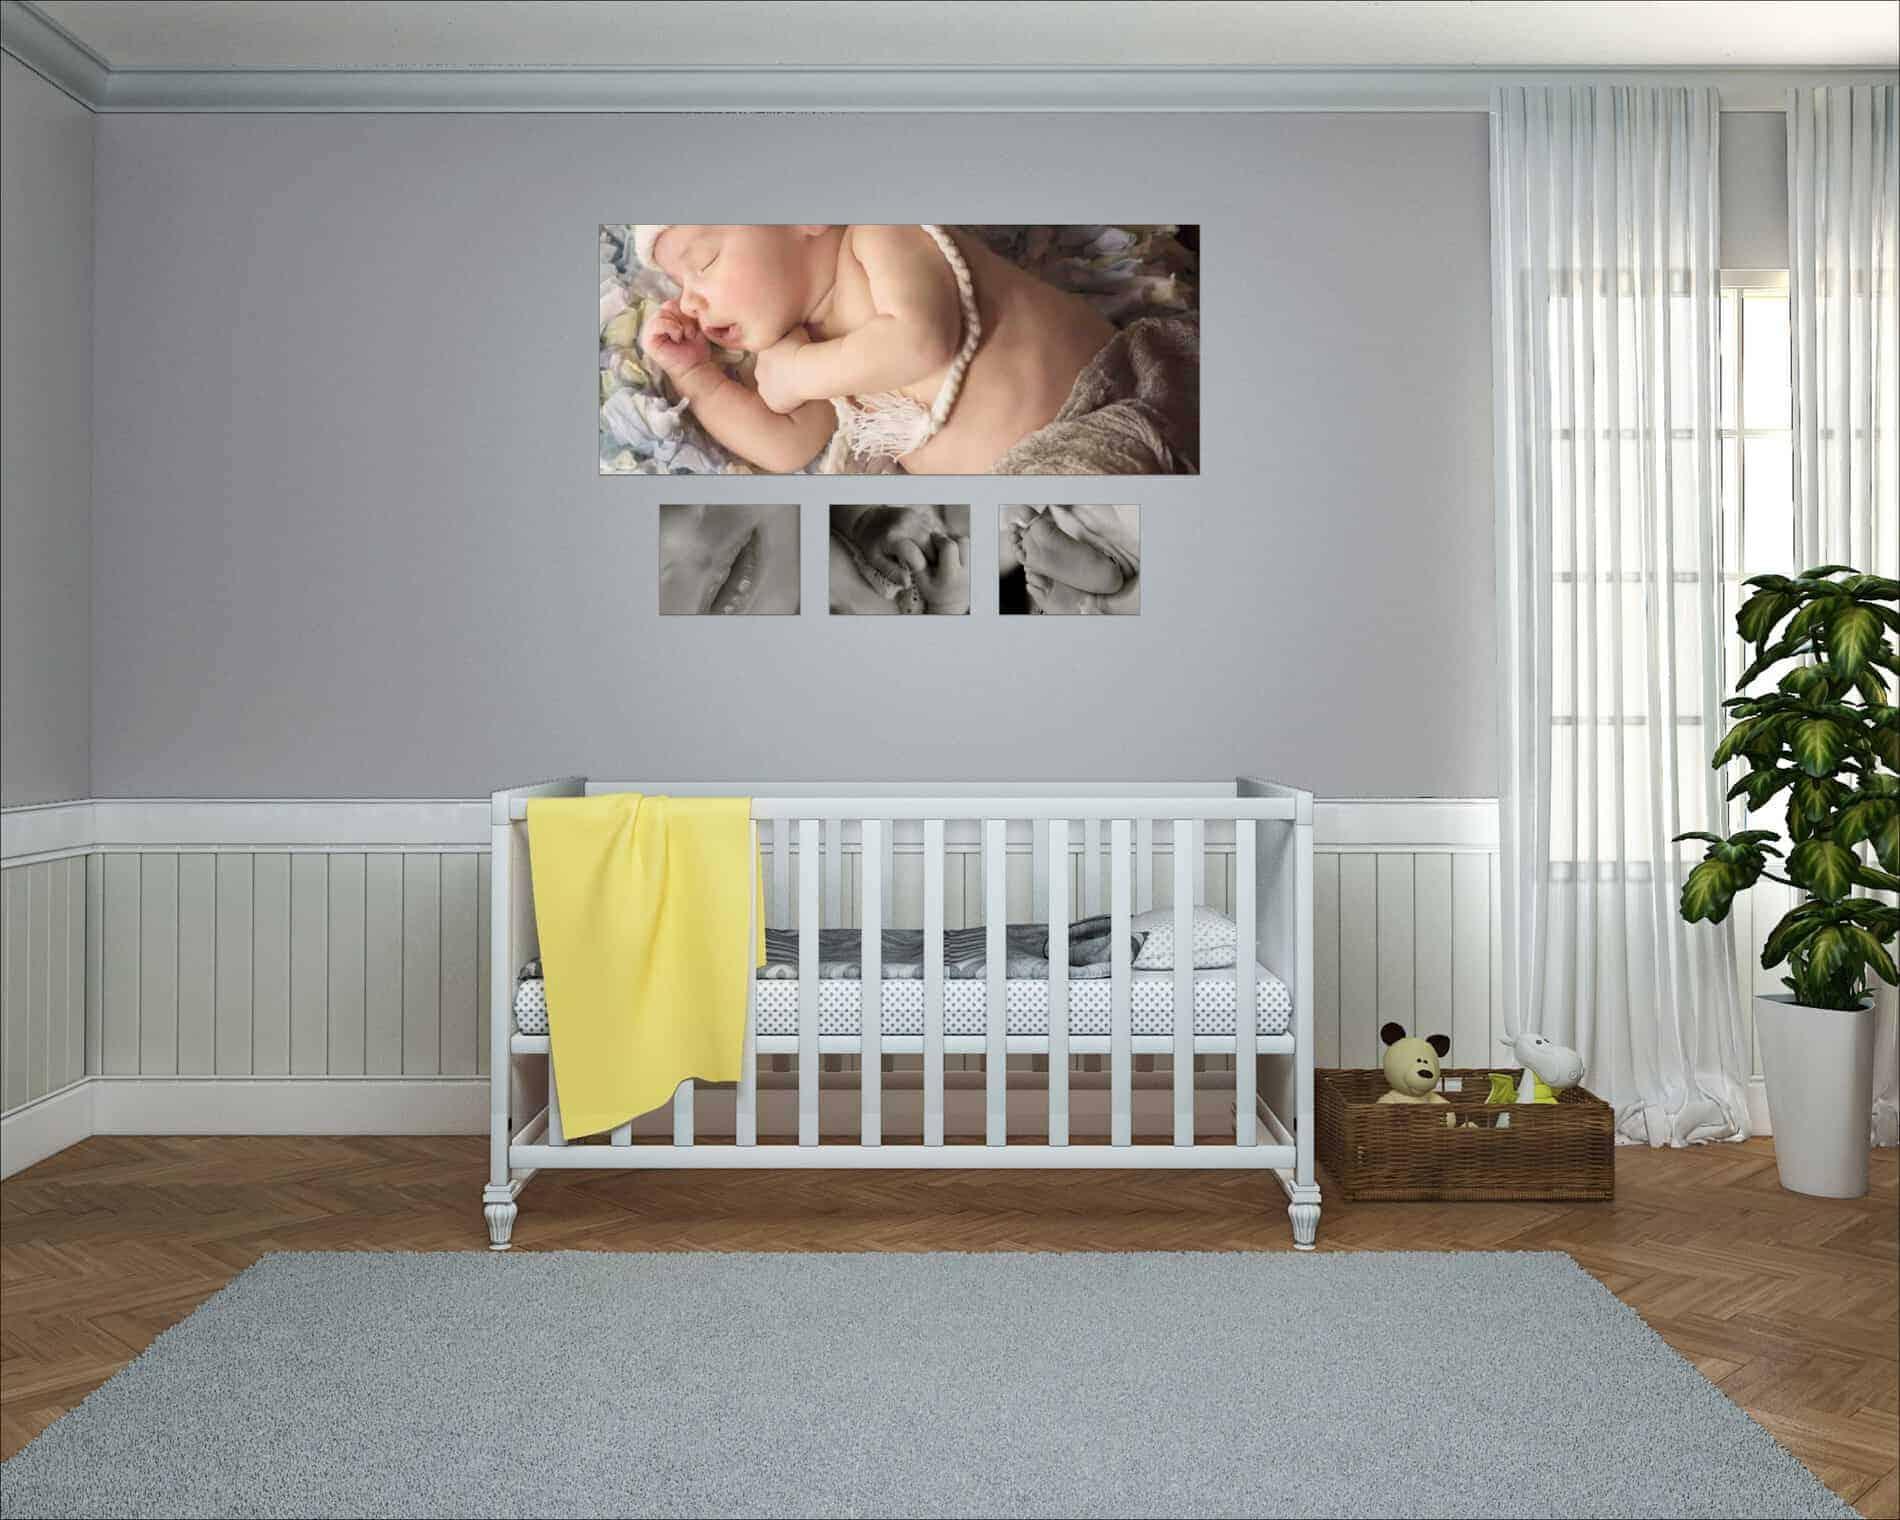 Newborn Family Wall Art Above Crib